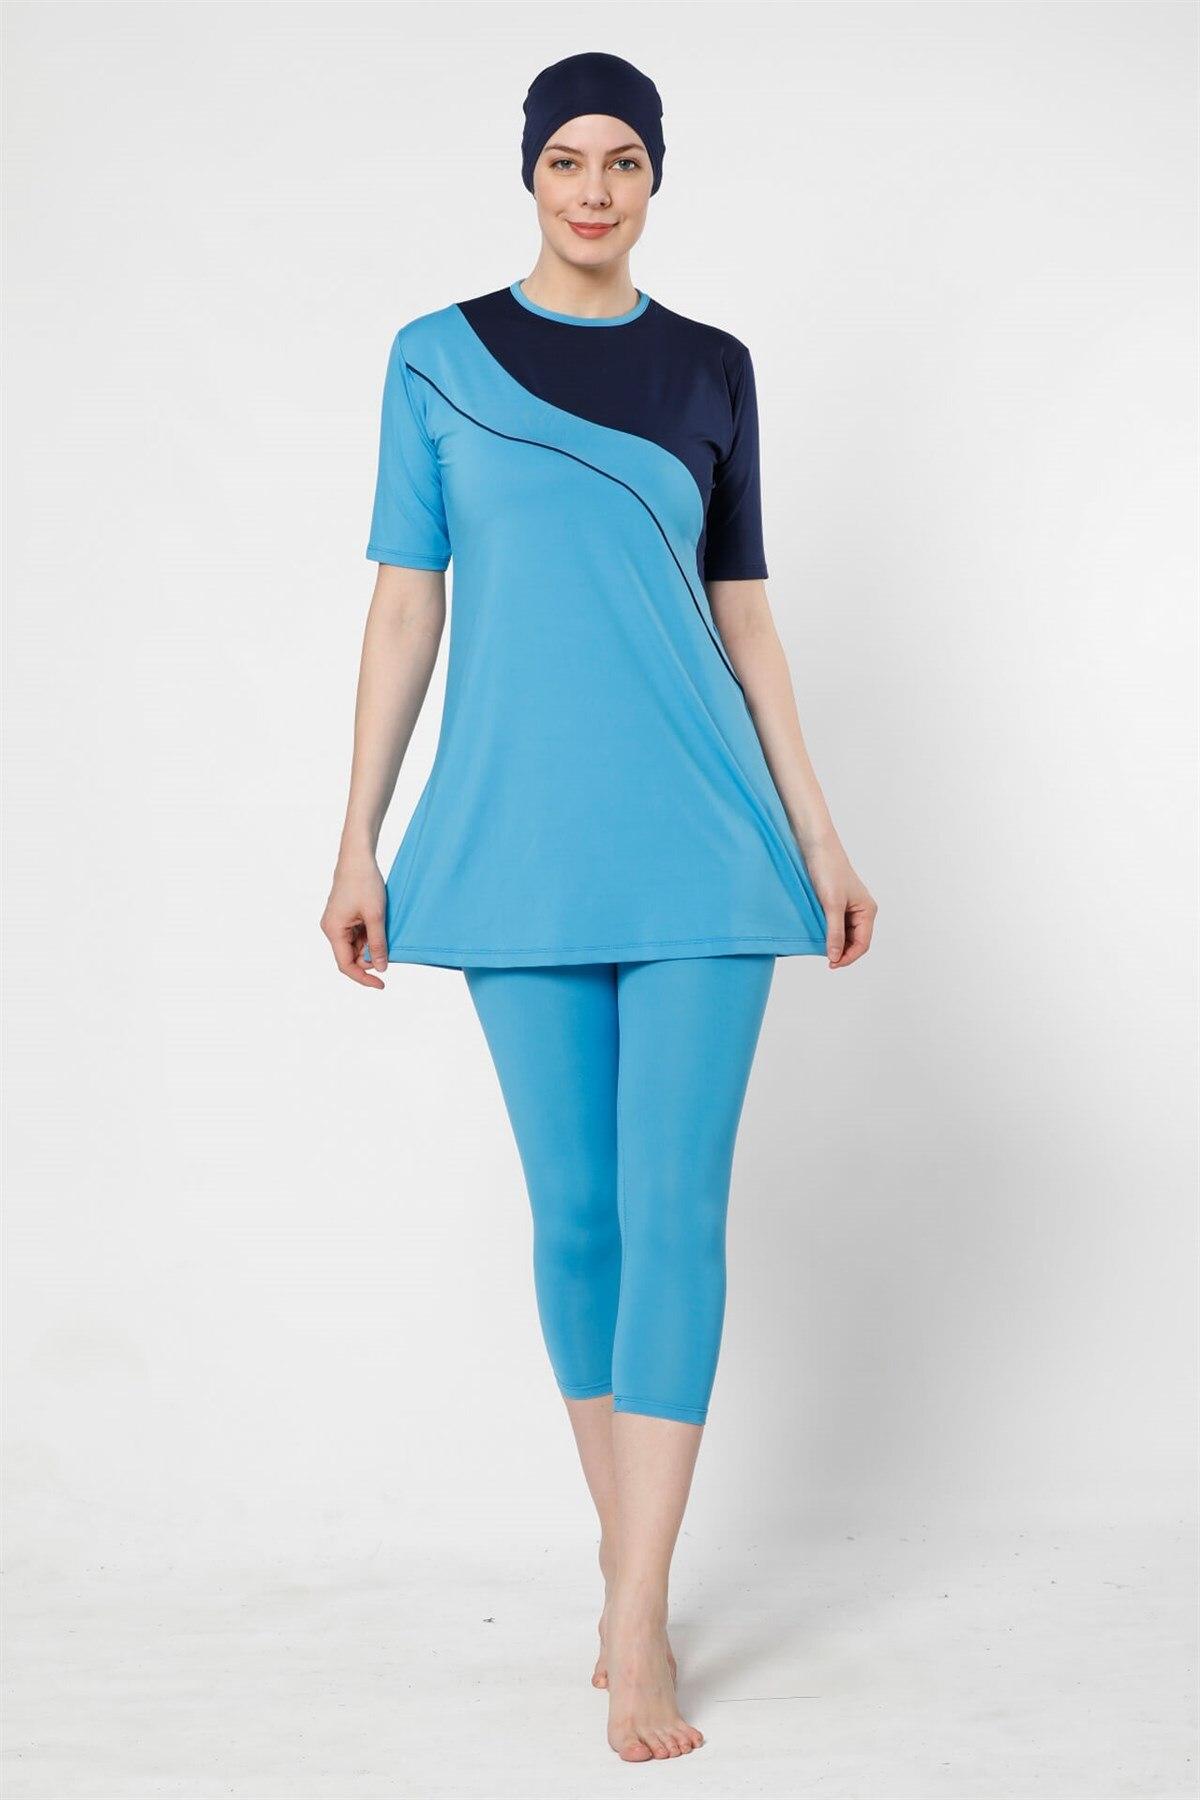 Fashion Cartoon Half Off The Tights Lycra Short Sleeve Hijab swimwear 28019